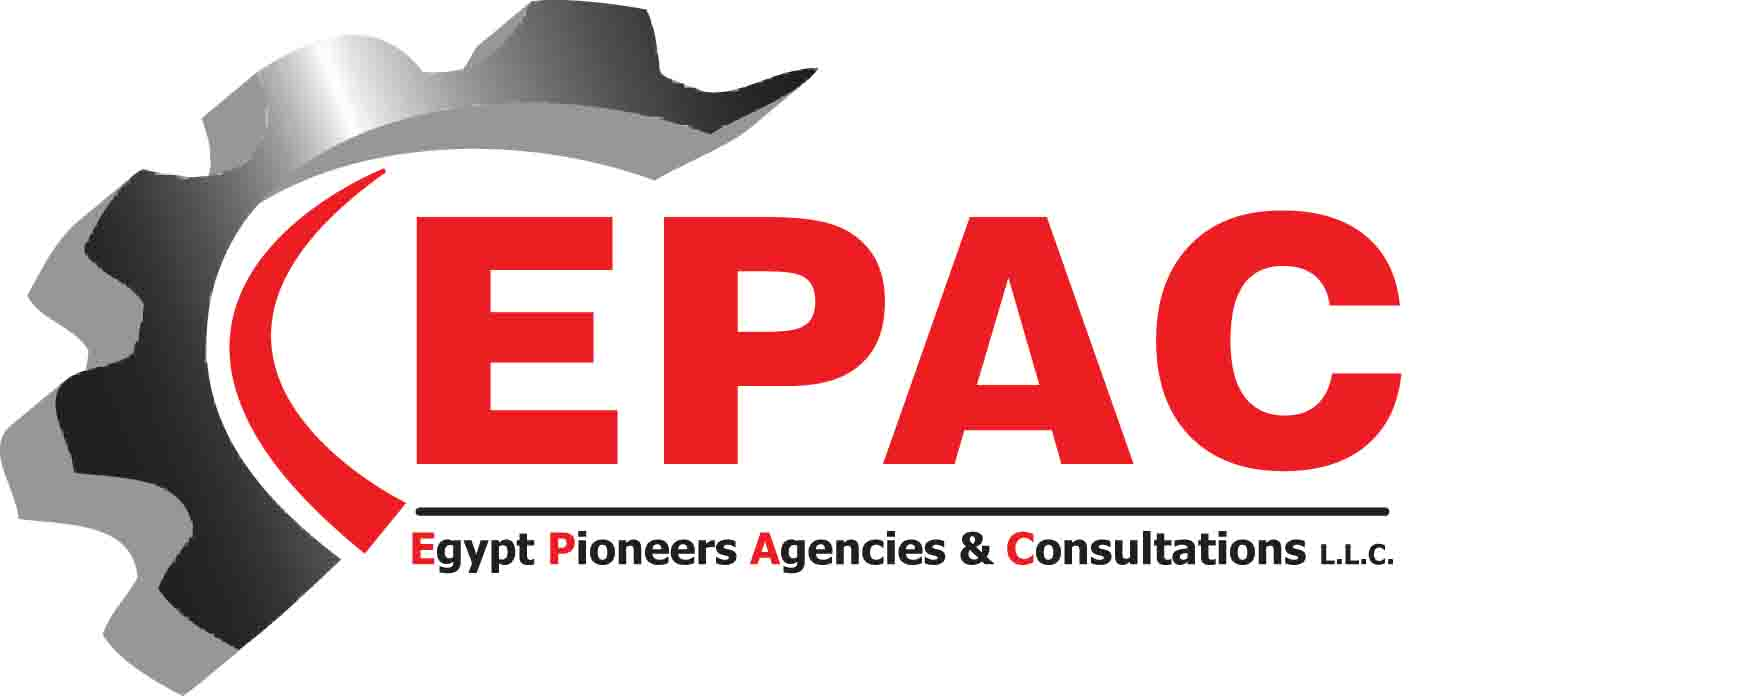 Egypt Pioneers Agencies & Consultations